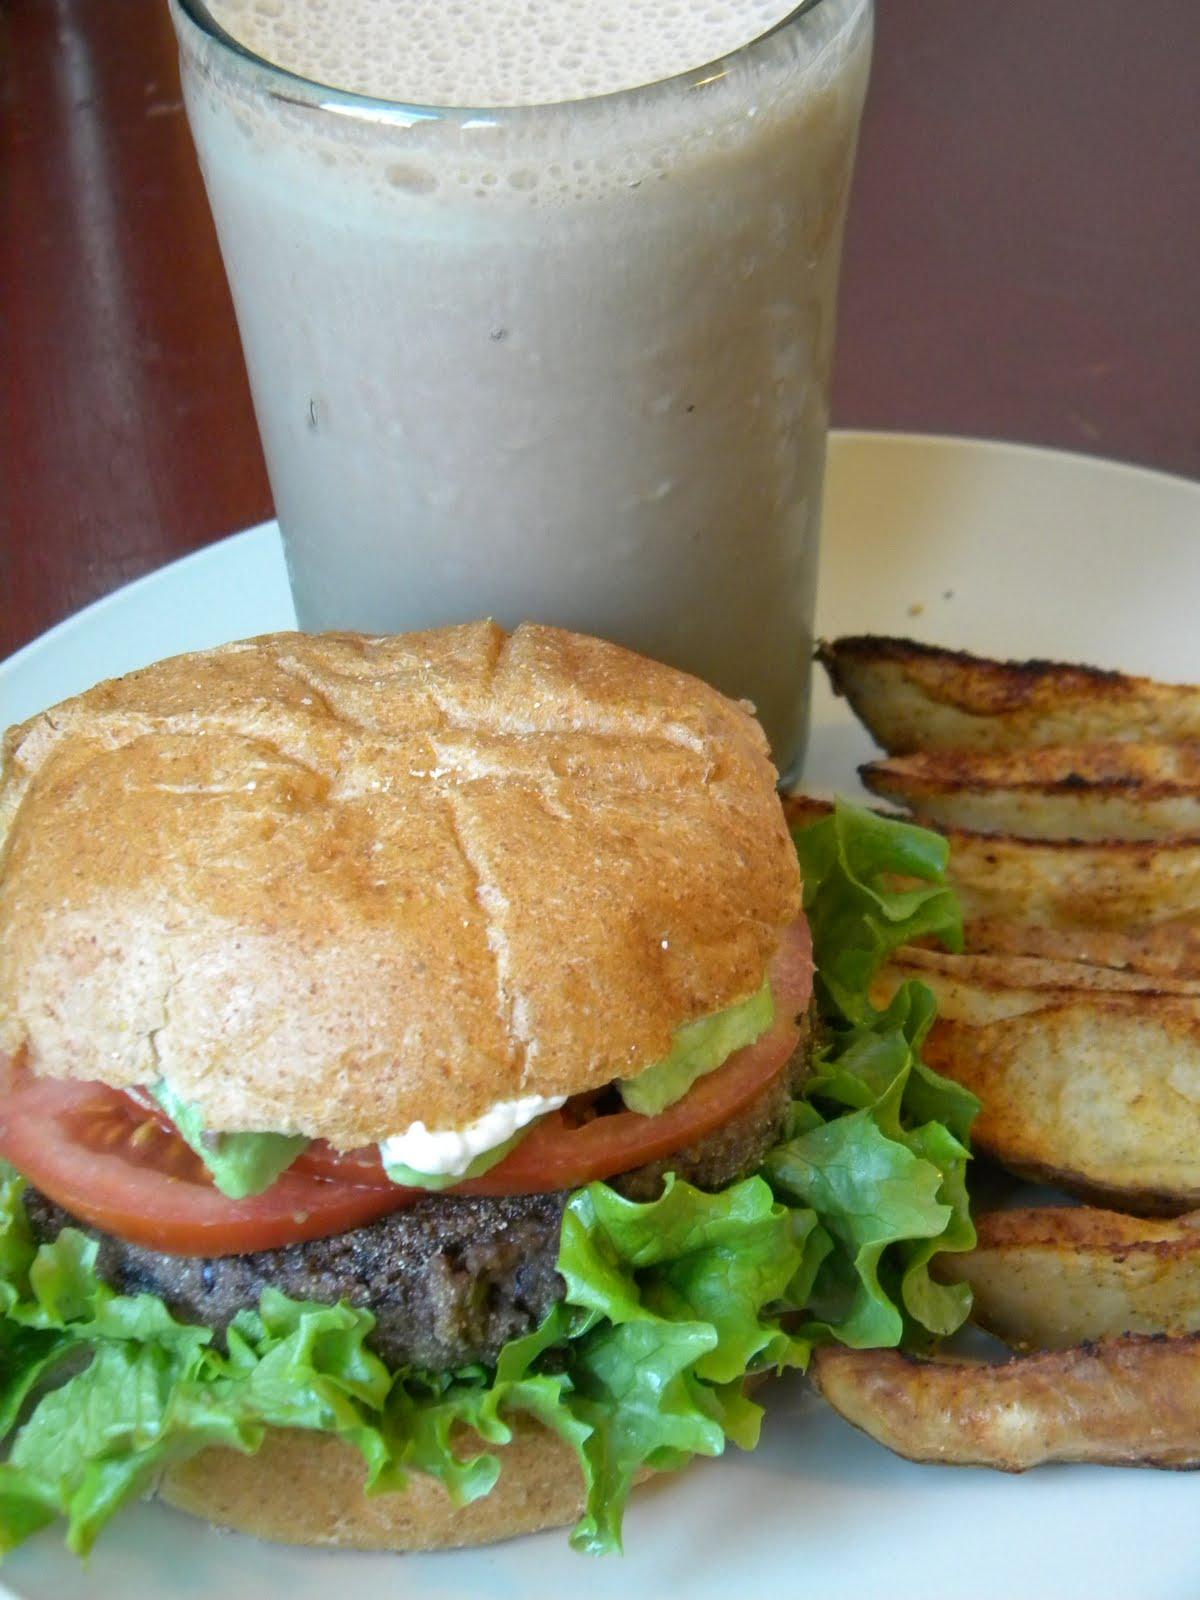 The Betty Crocker Project : California Black Bean Burgers, Oven-Fried Potato Wedges, and Chocolate Milkshake